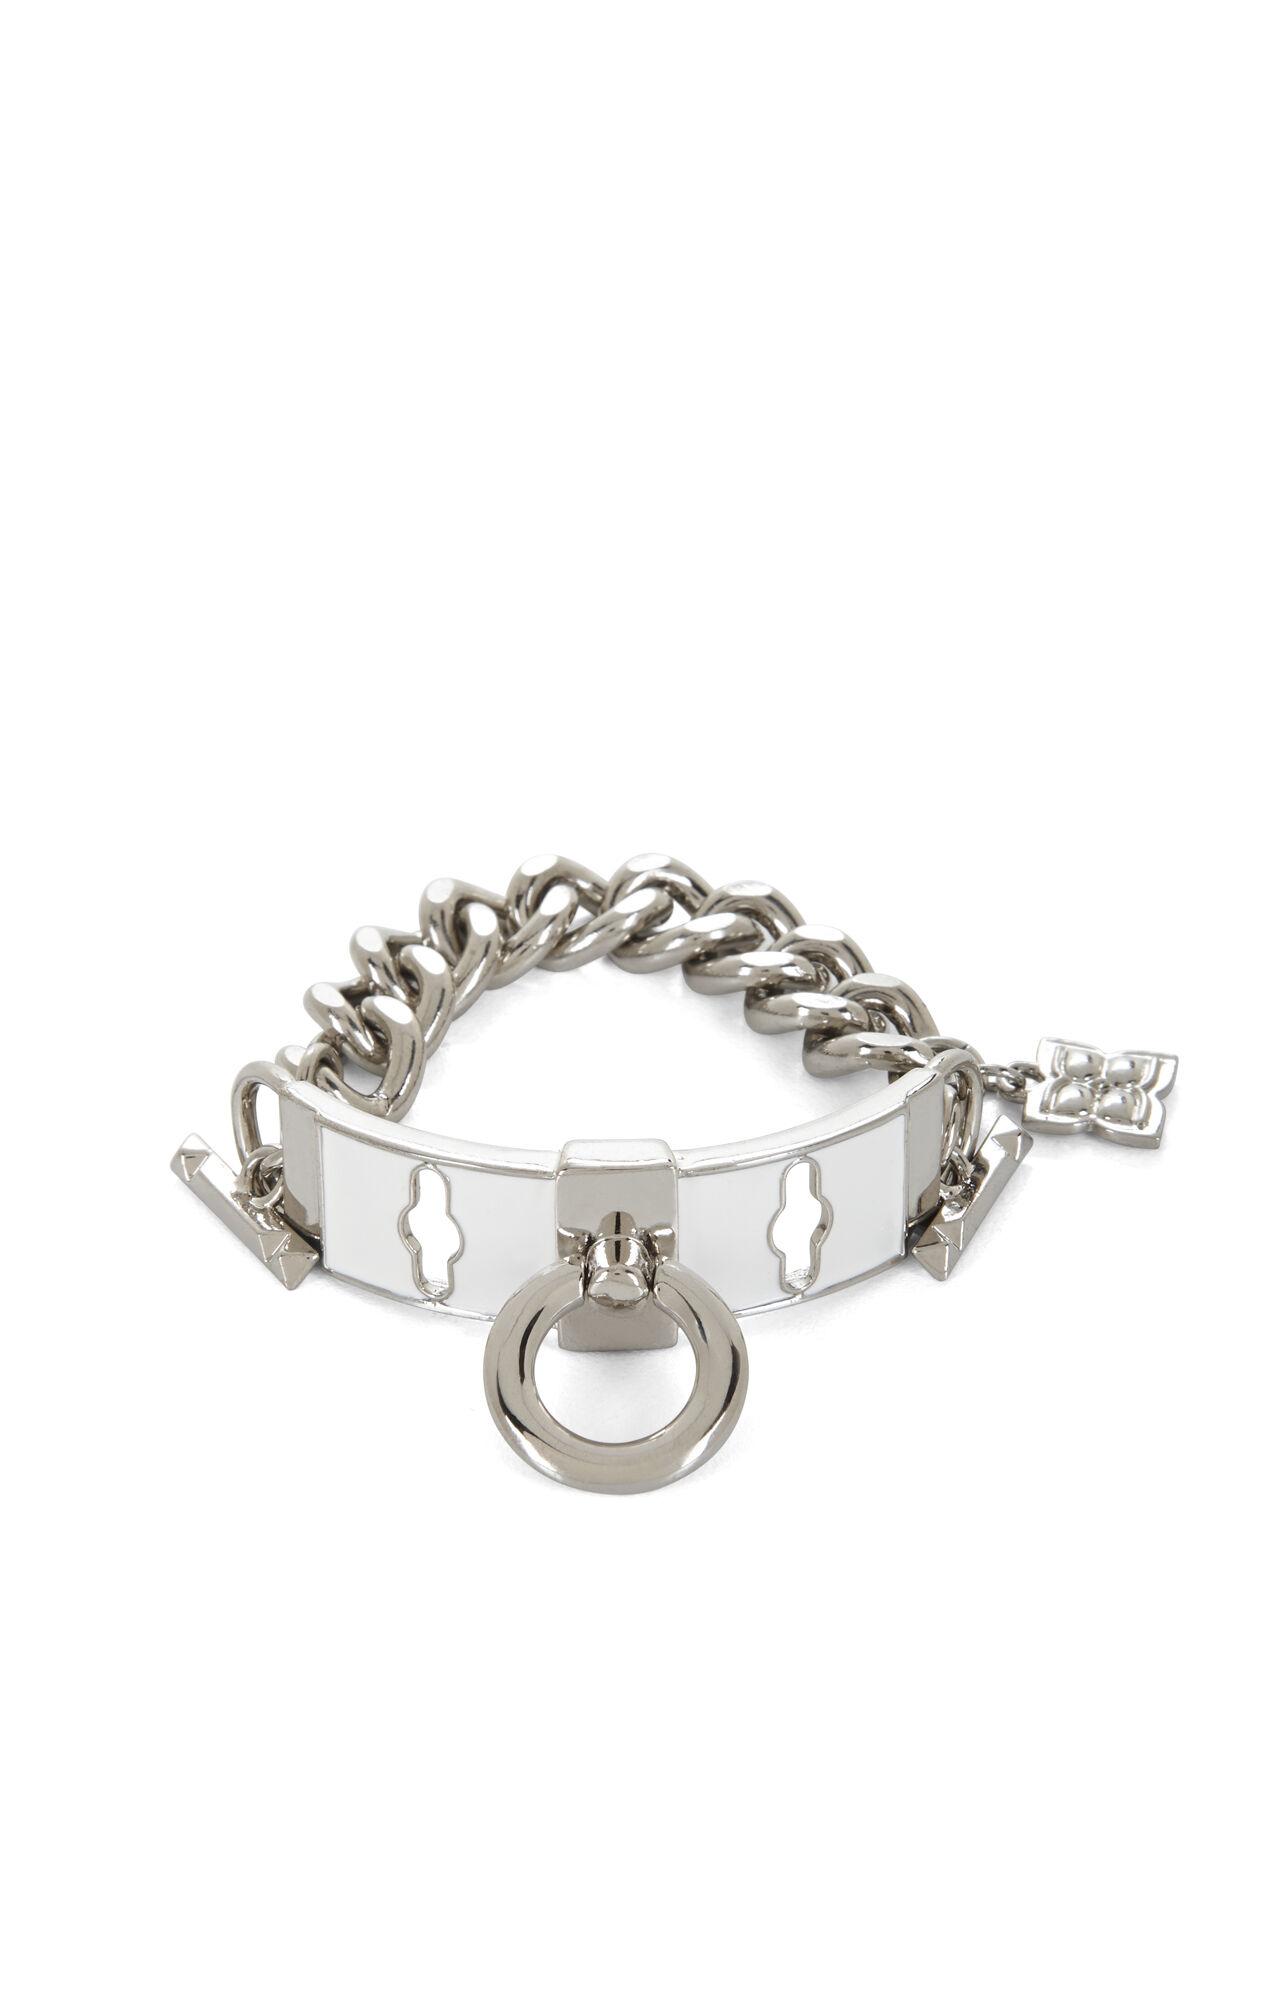 Enamel Toggle Chain Bracelet